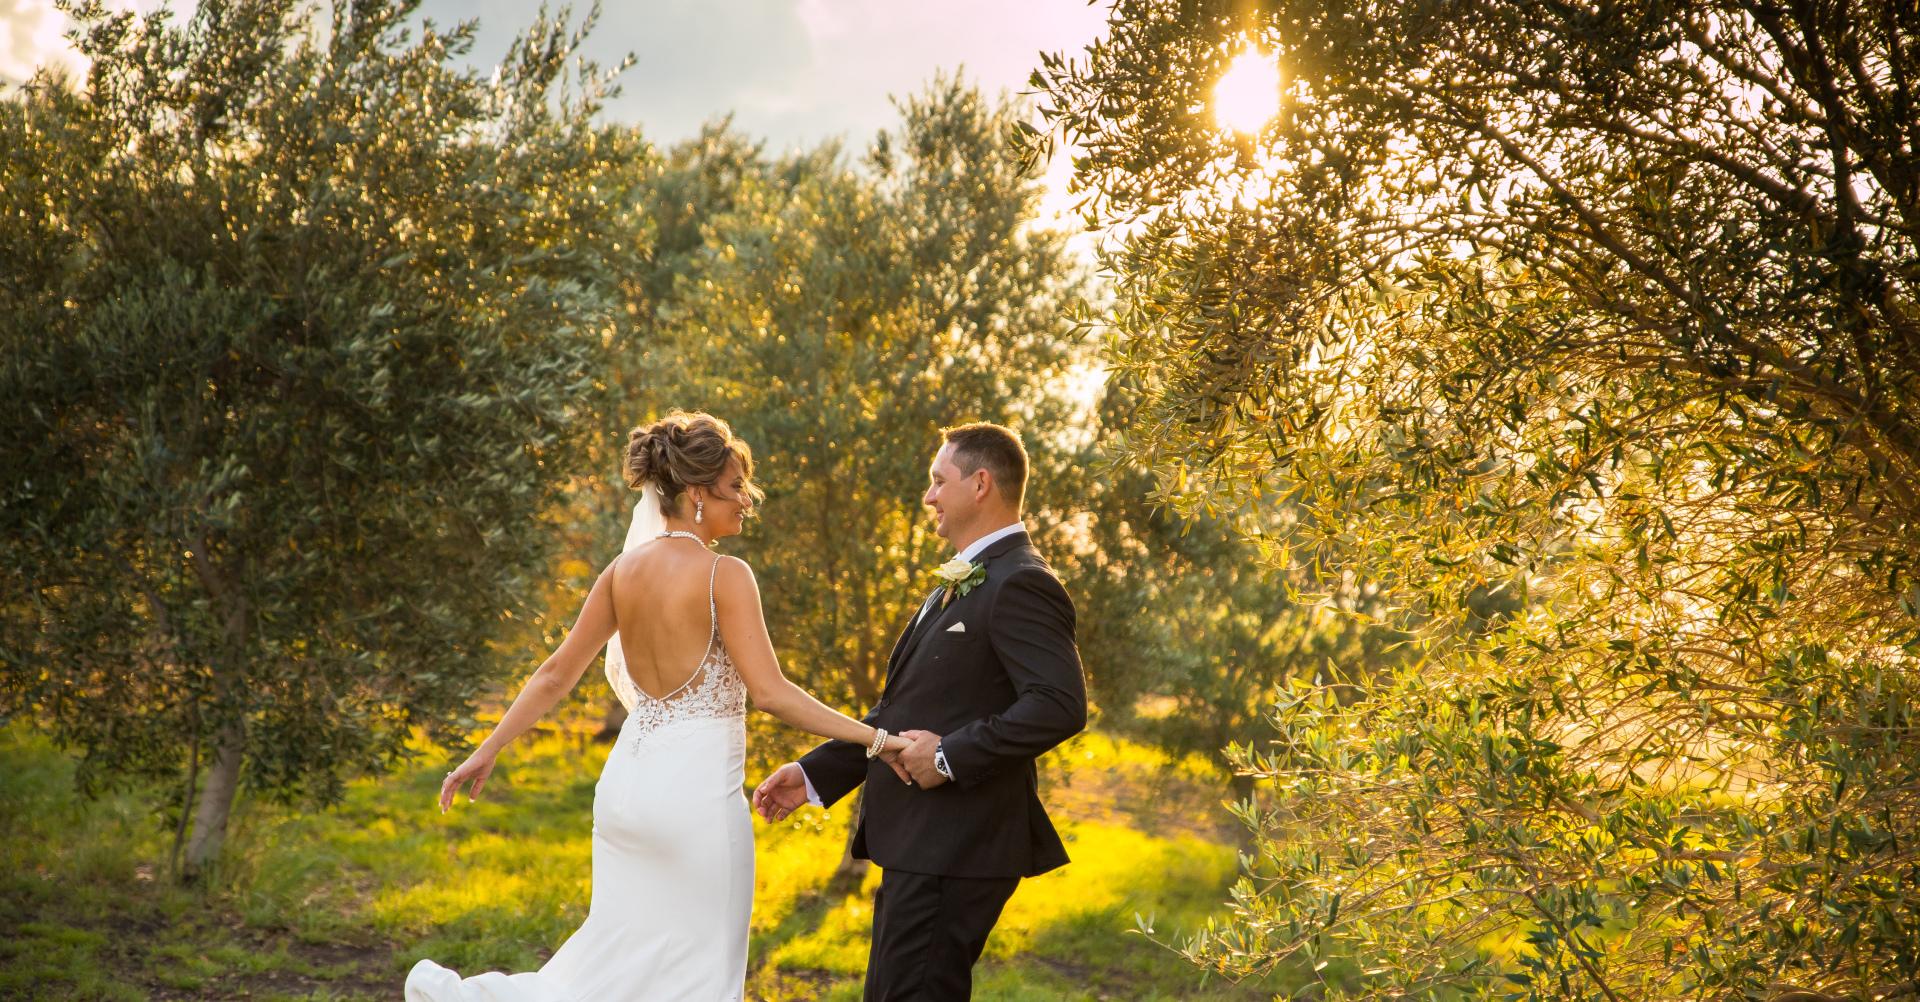 Scott & Amy | Adora Downs | Toowoomba Wedding Photography